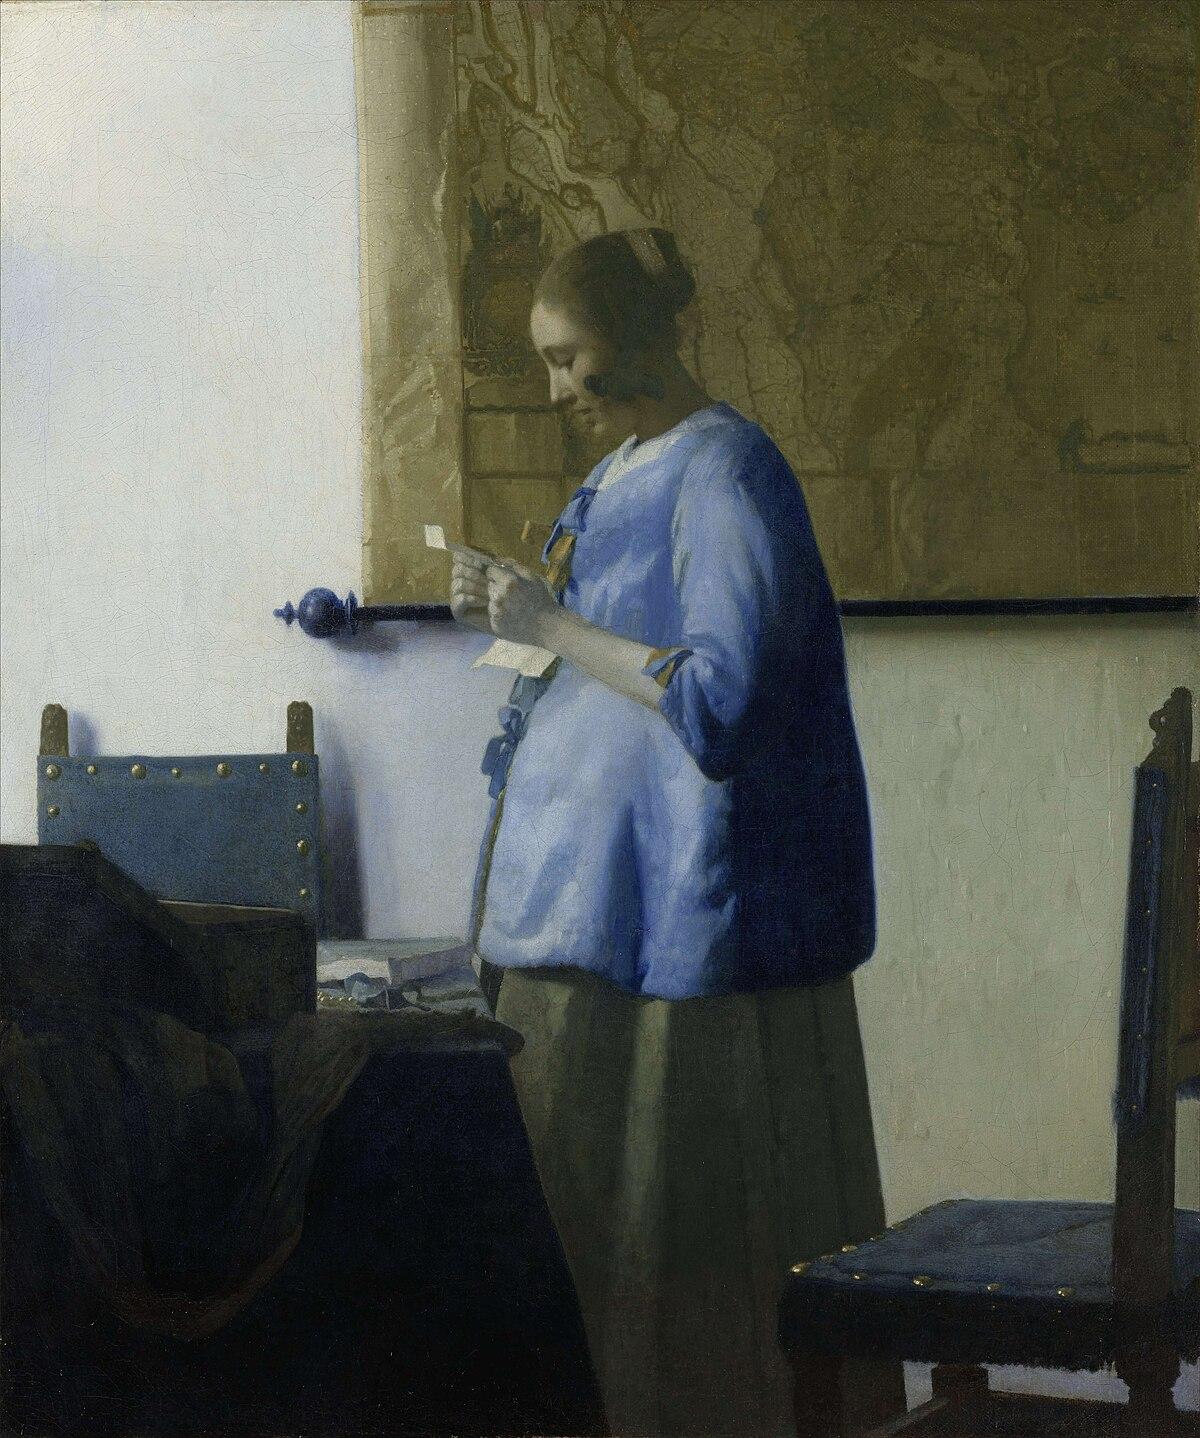 Vermeer, Johannes - Woman reading a letter - ca. 1662-1663.jpg